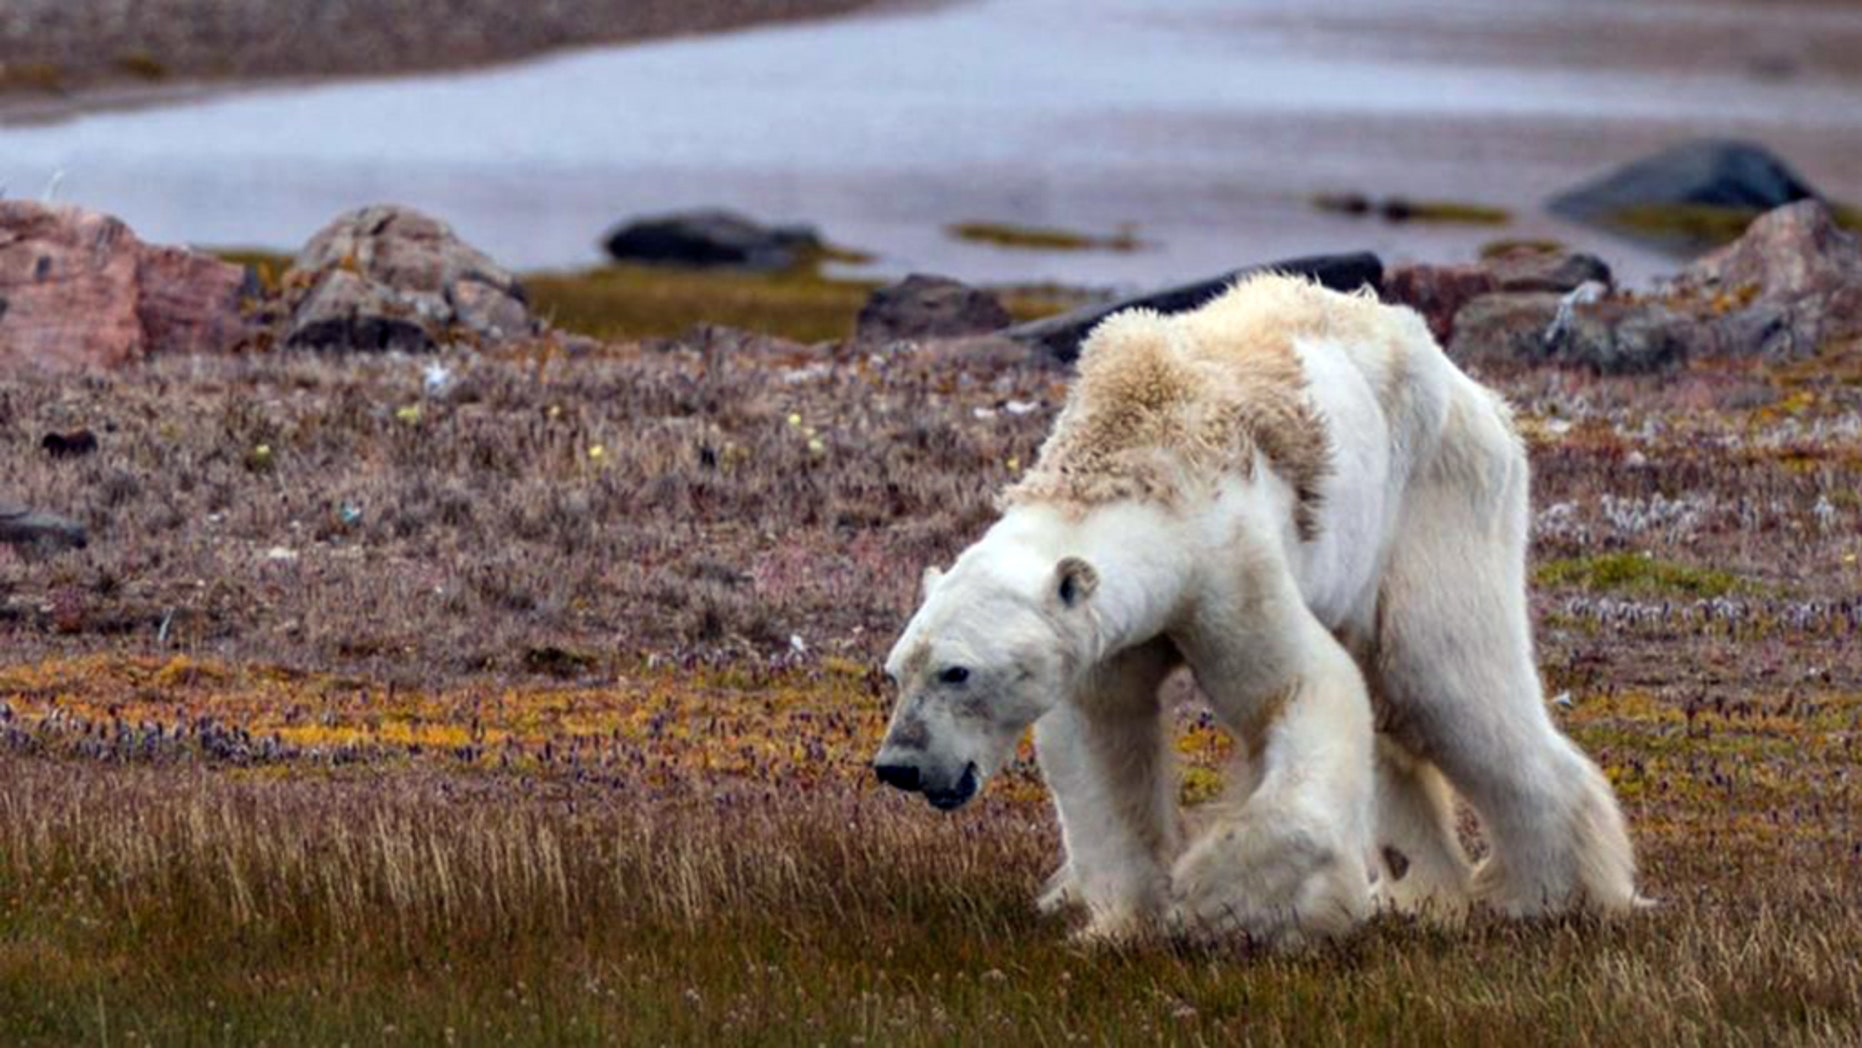 An image of the emaciated polar bear